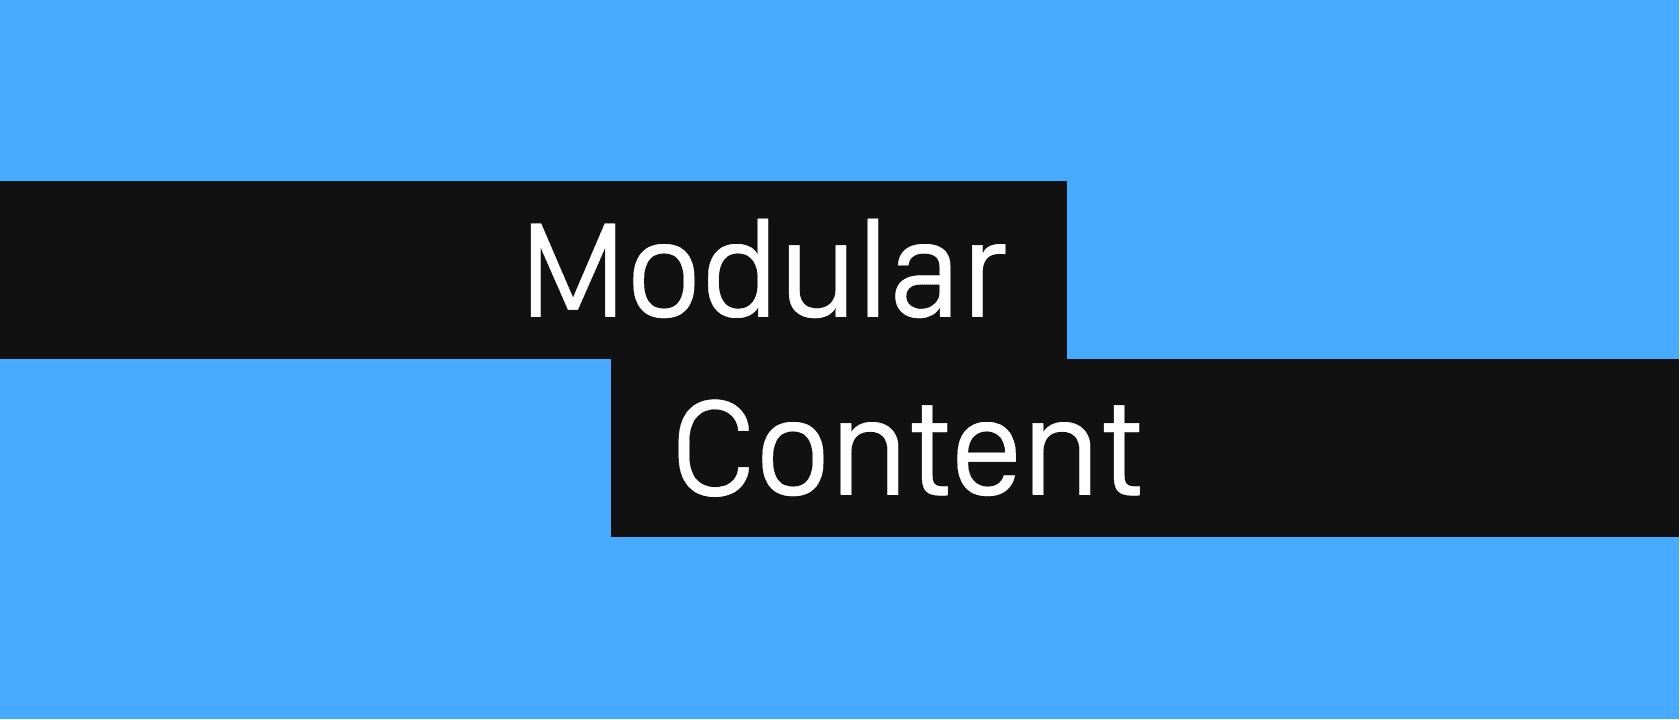 Modular Content 21:9